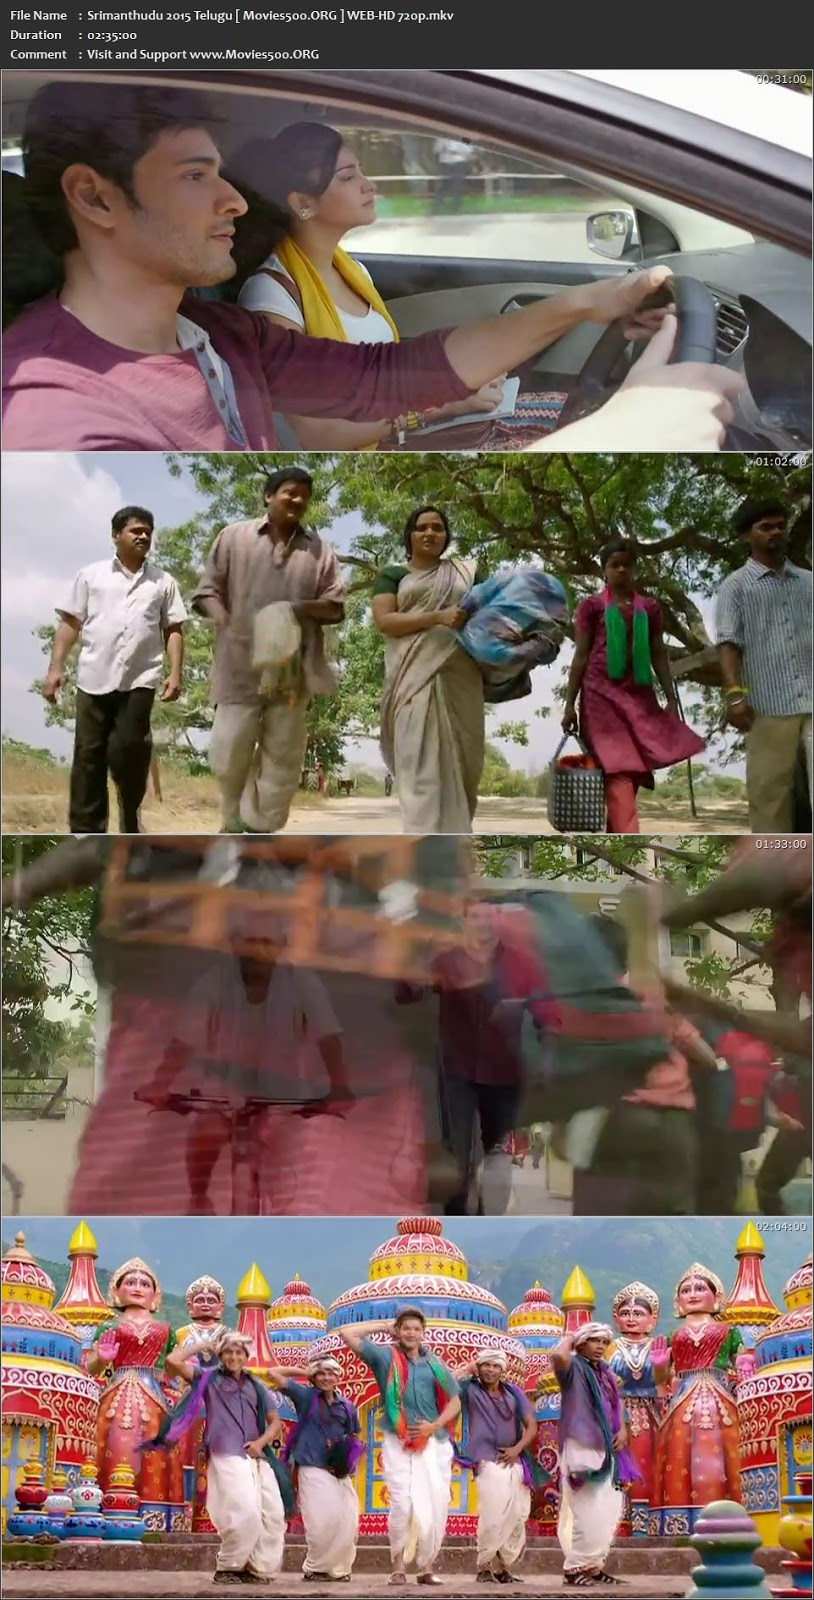 Srimanthudu 2015 Telugu Full Movie WEB HD 720p at movies500.site